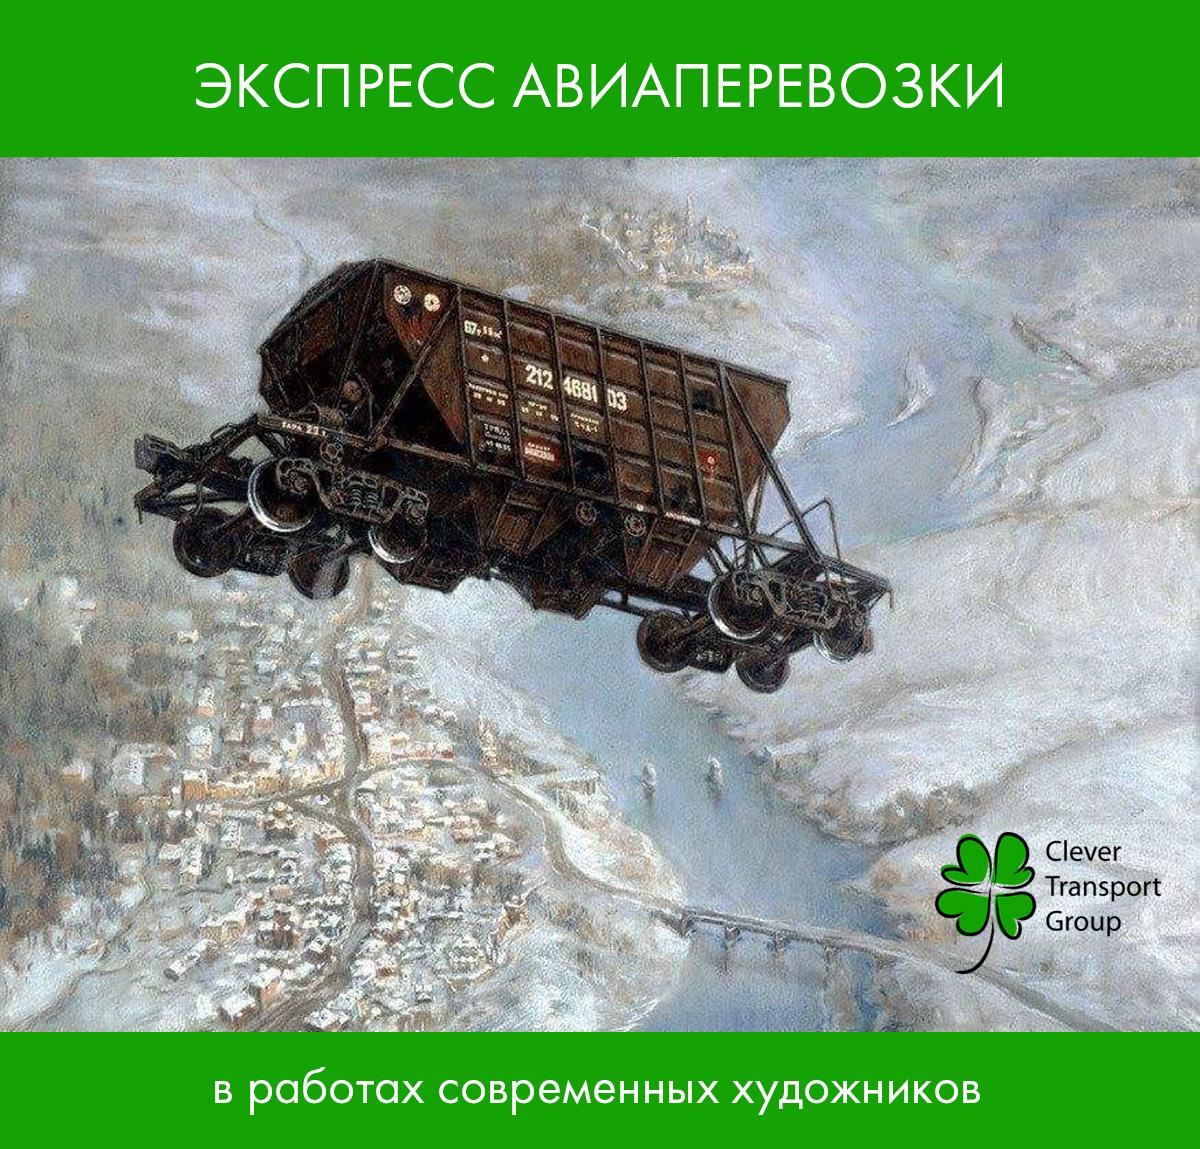 express avia perevozka